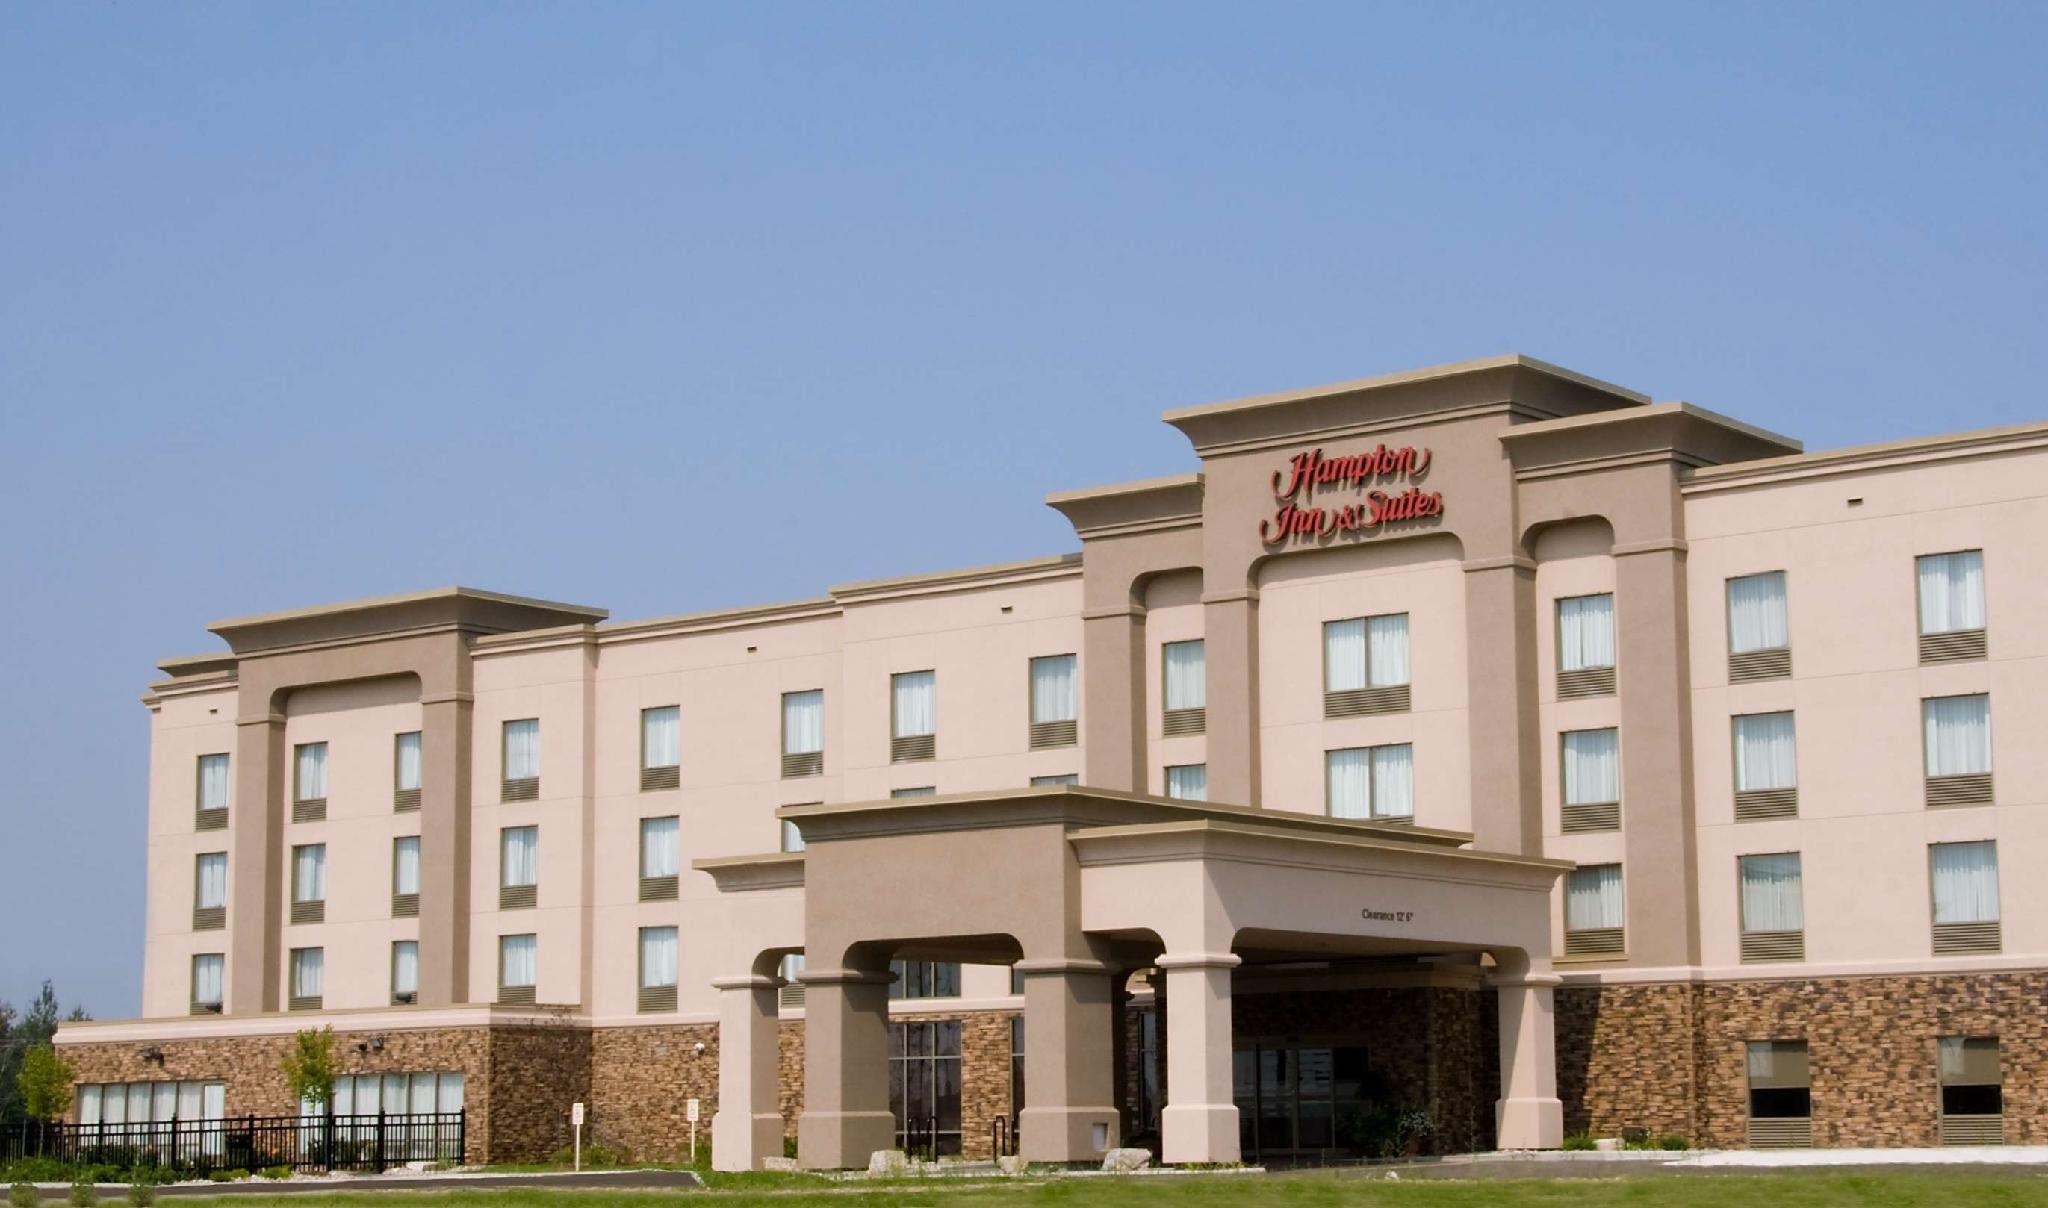 Hampton Inn and Suites Guelph Ontario Reviews